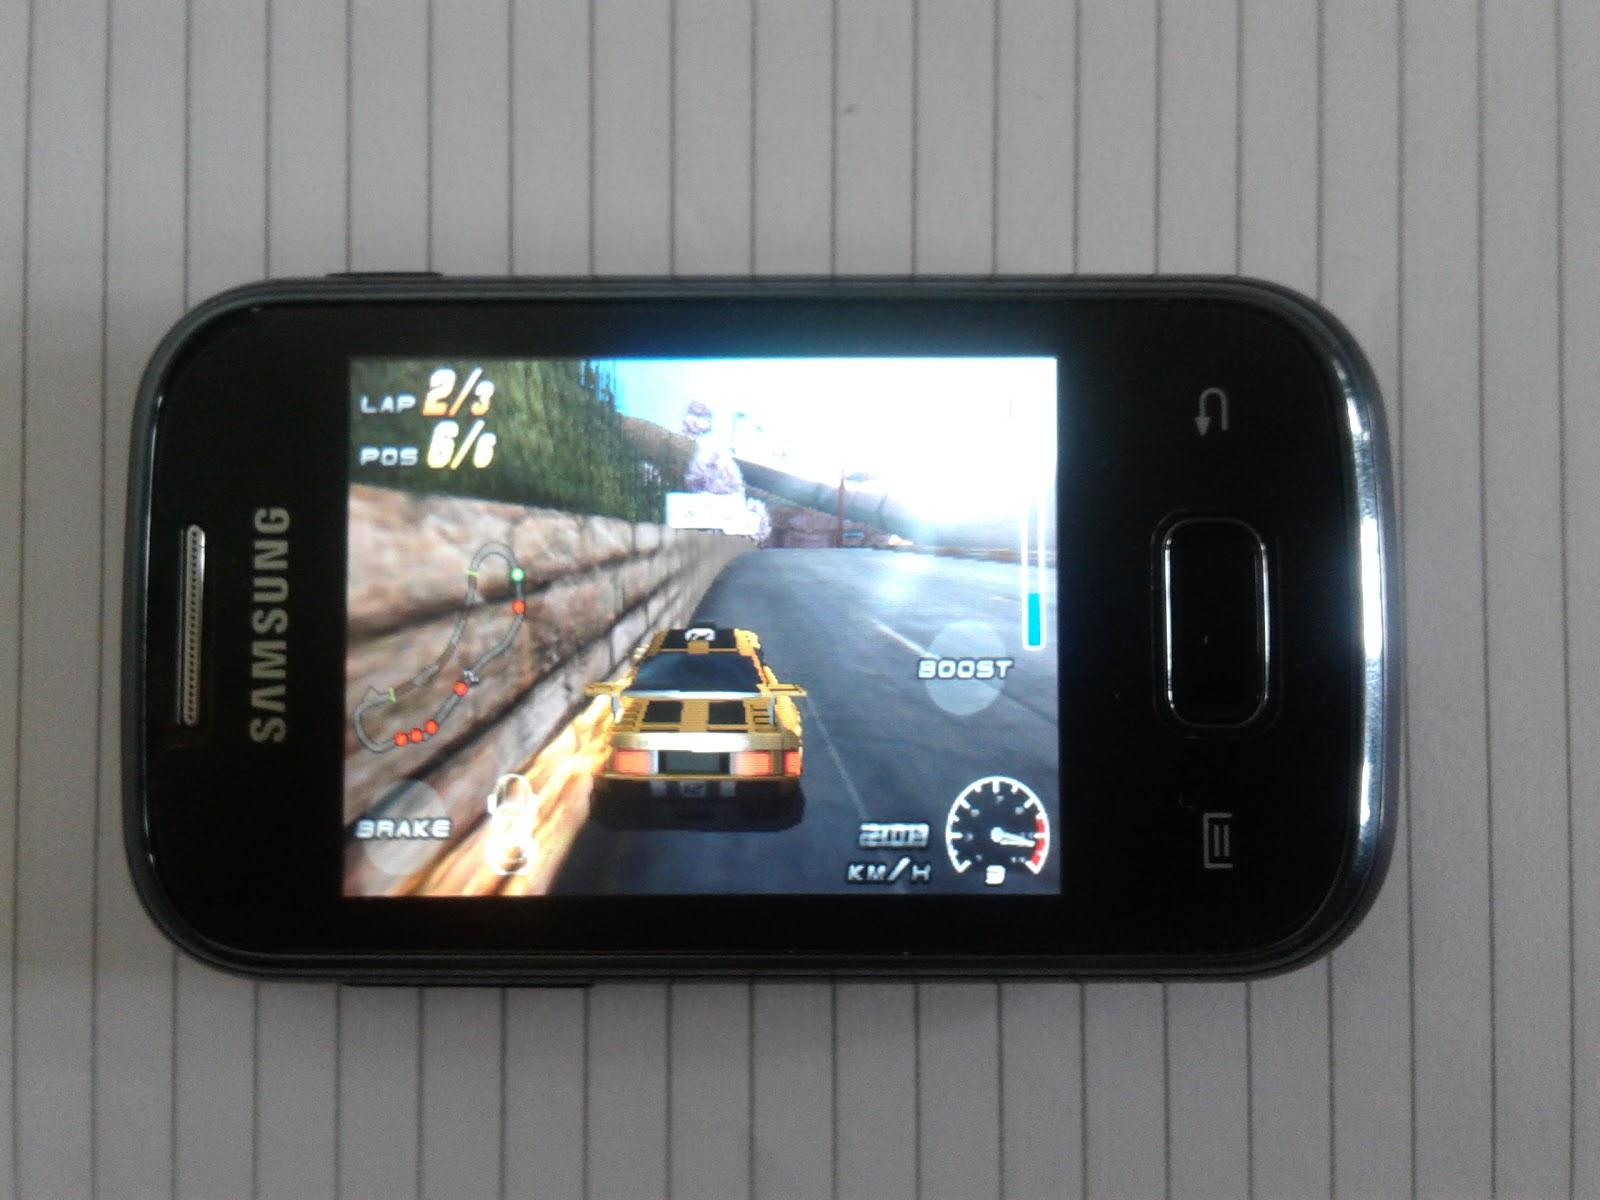 ... gameloft samsung samsung jadi android merupakan samsung 1 berfungsi